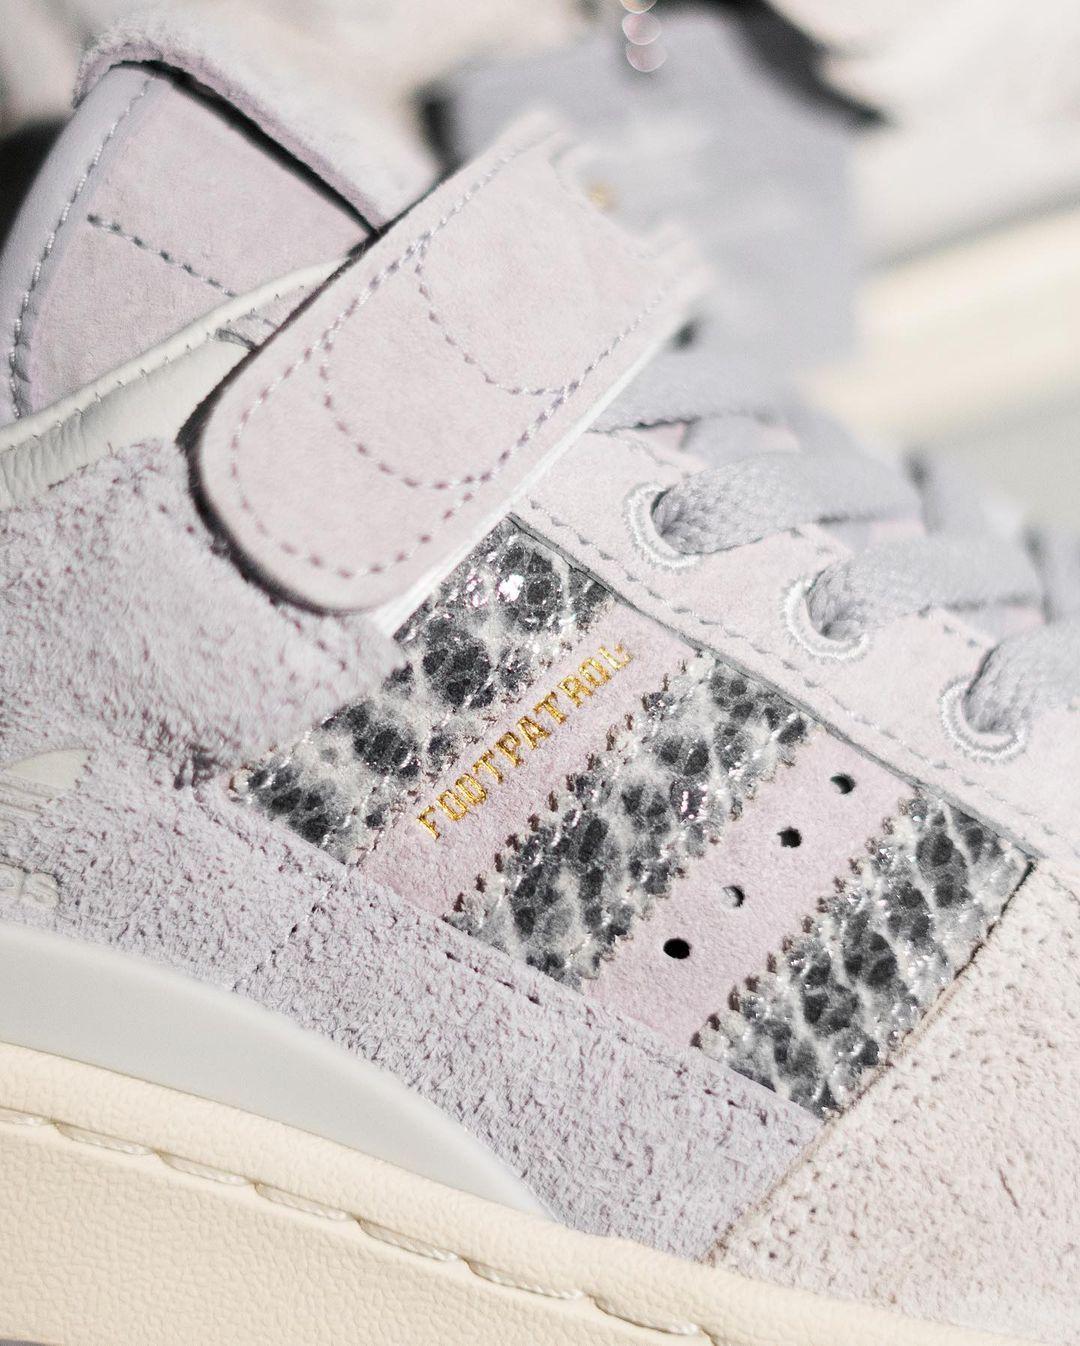 adidas Originals携手Footpatrol呈上联名新款Forum 84 Low